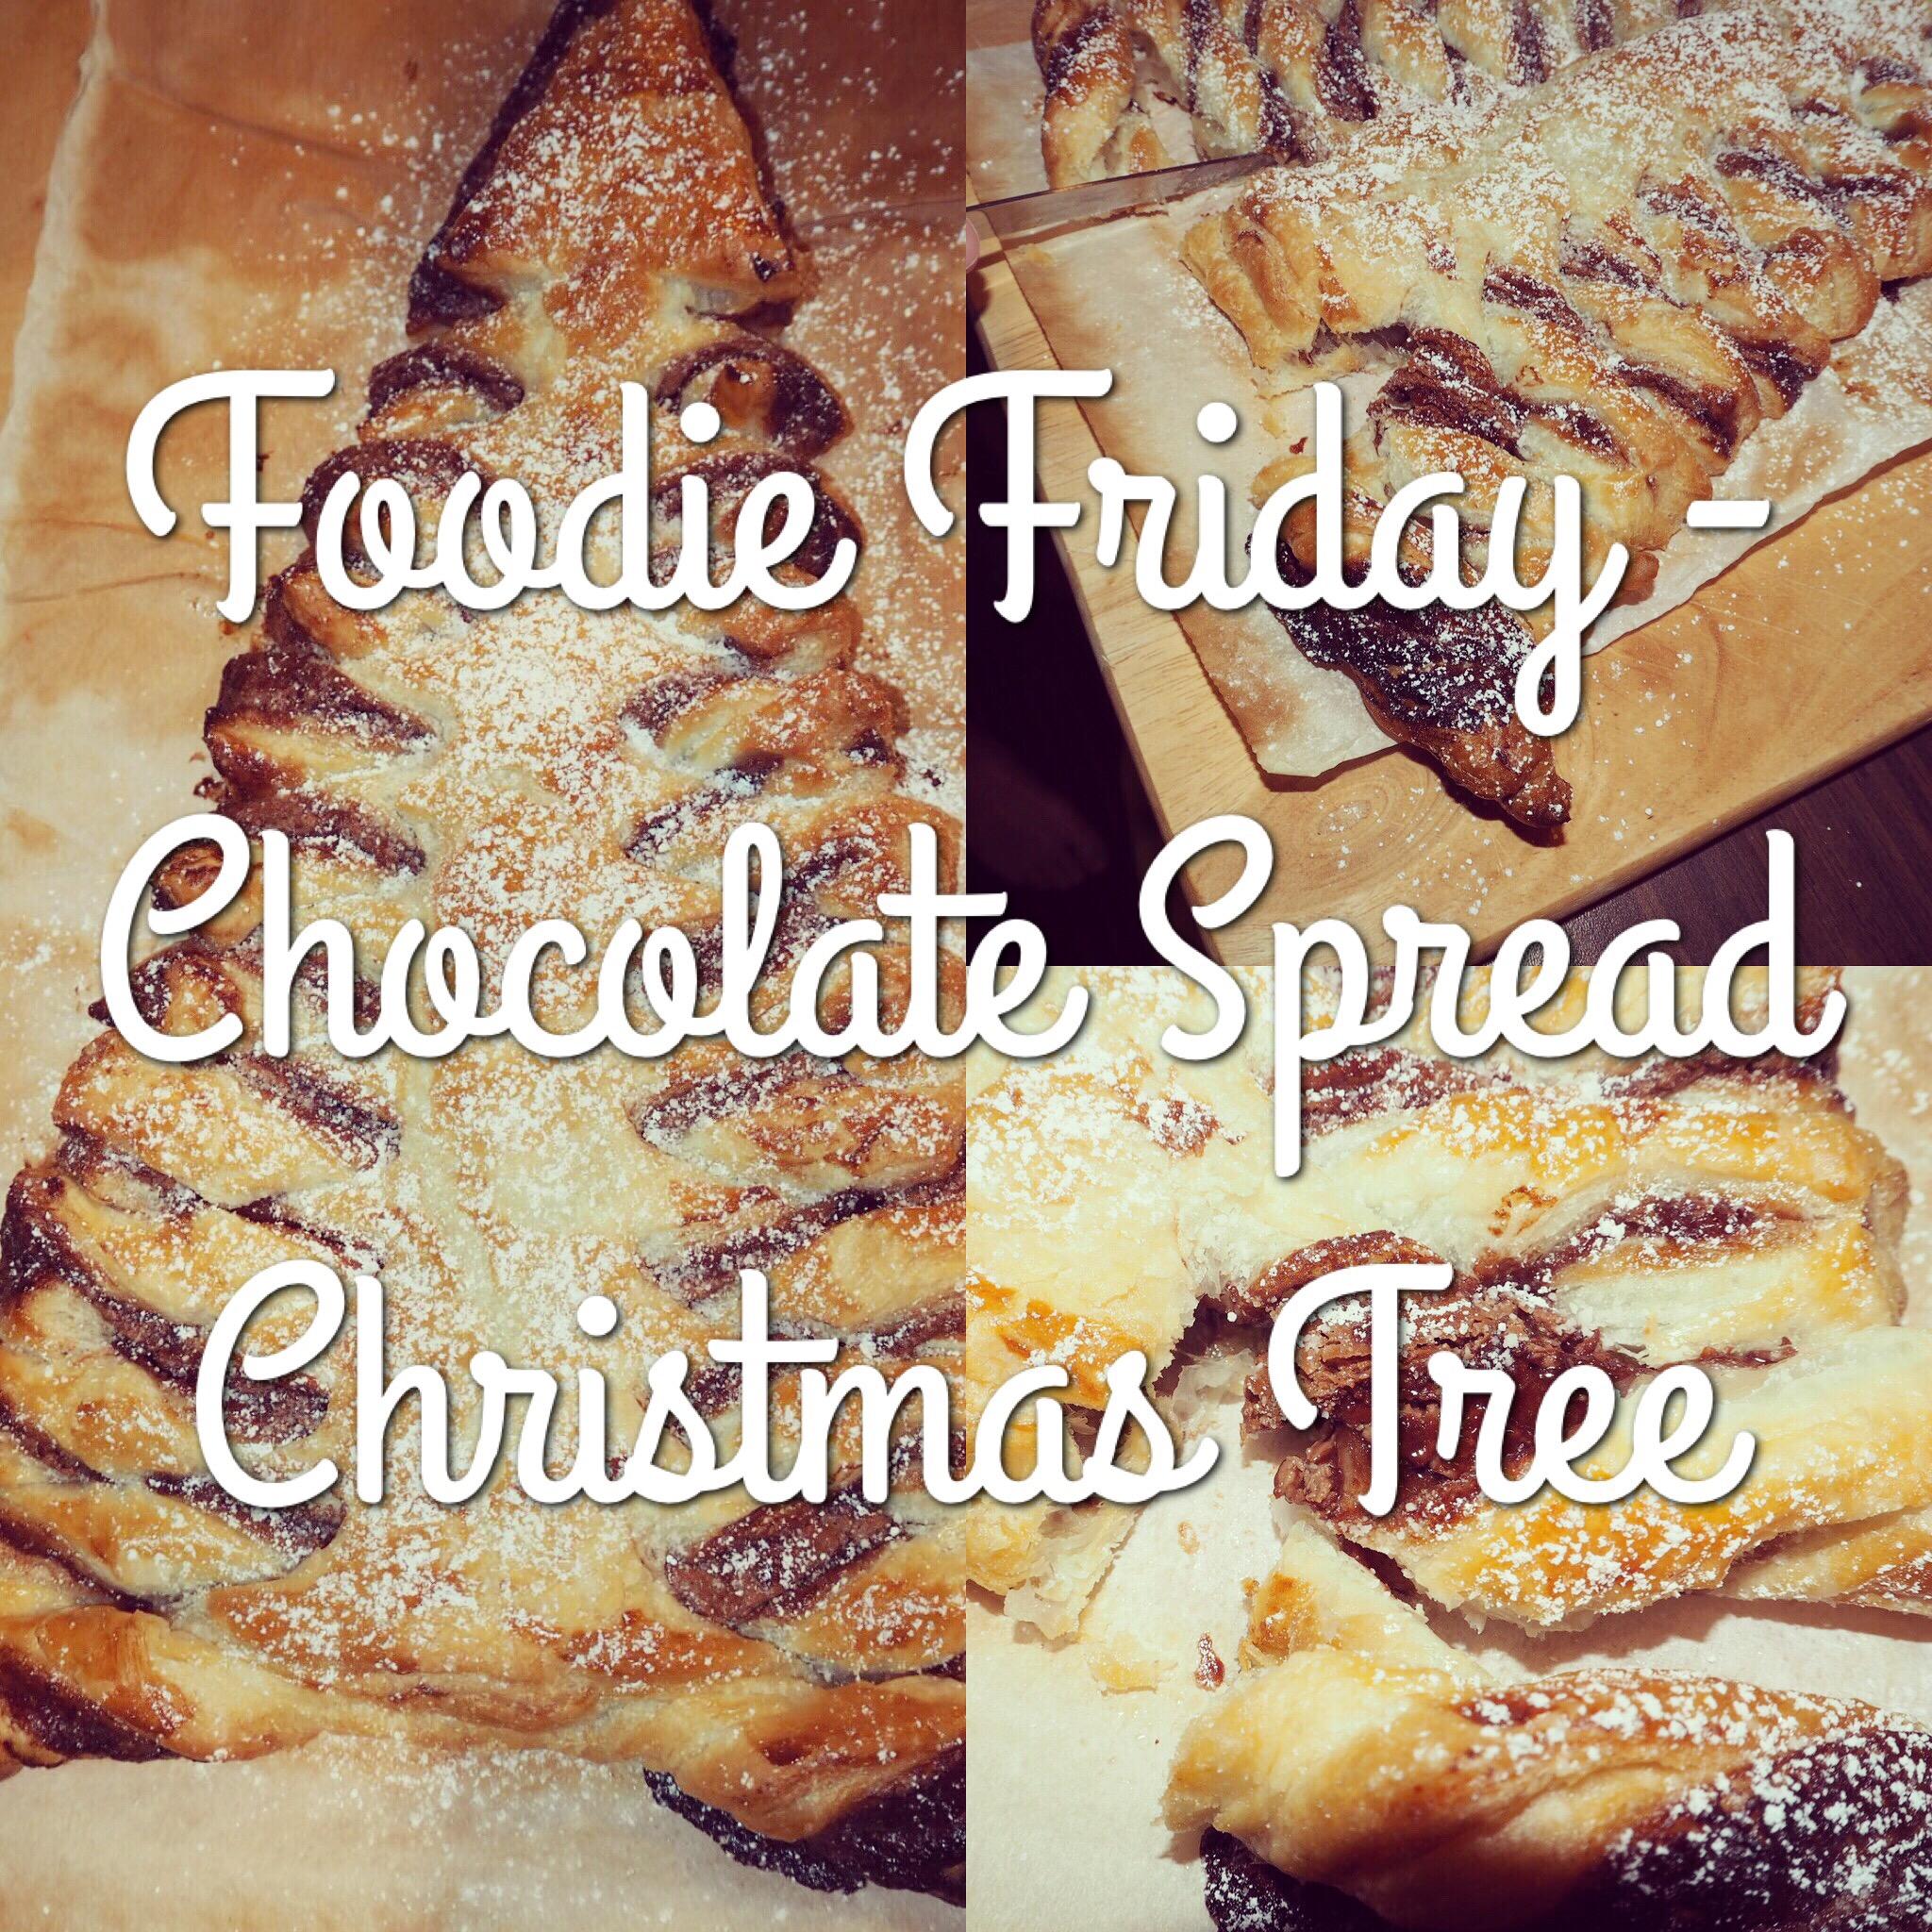 Foodie Friday - Chocolate Spread Christmas Tree - evenangelsfall